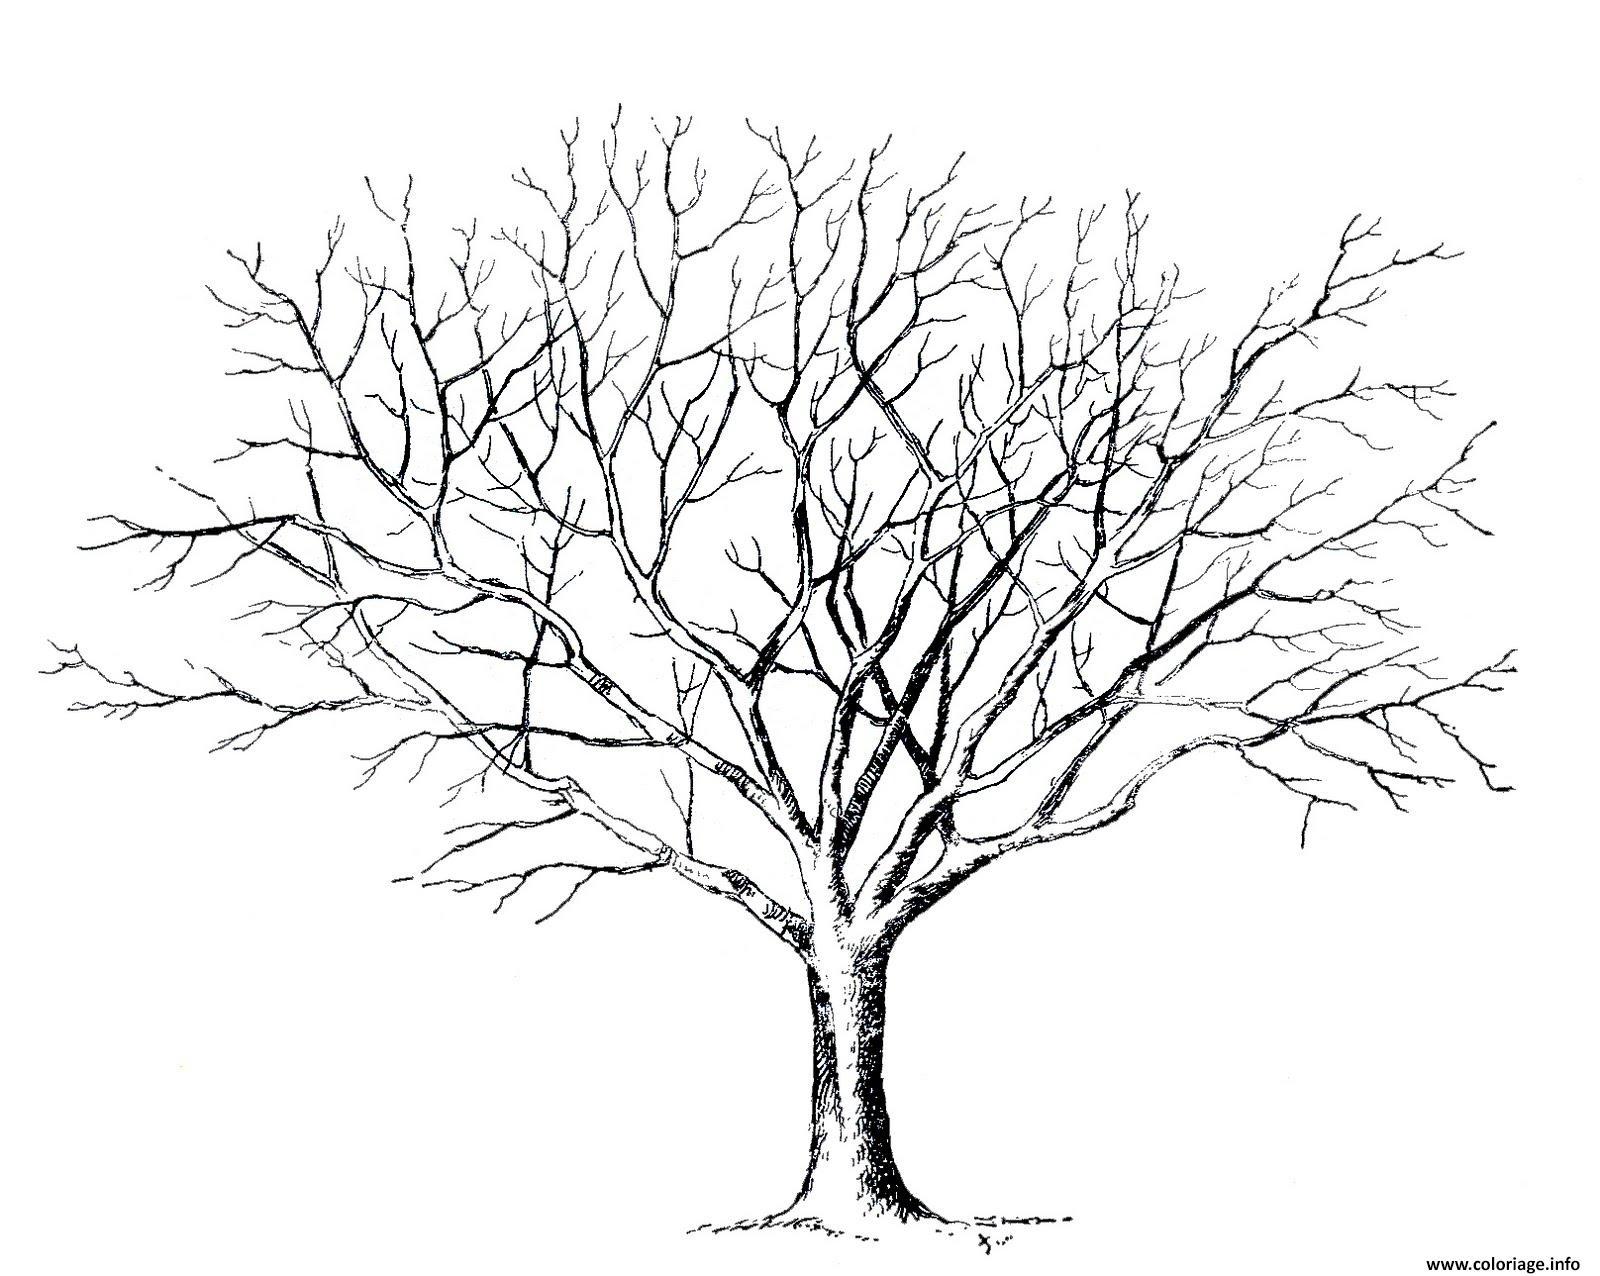 Coloriage arbre 96 - JeColorie.com